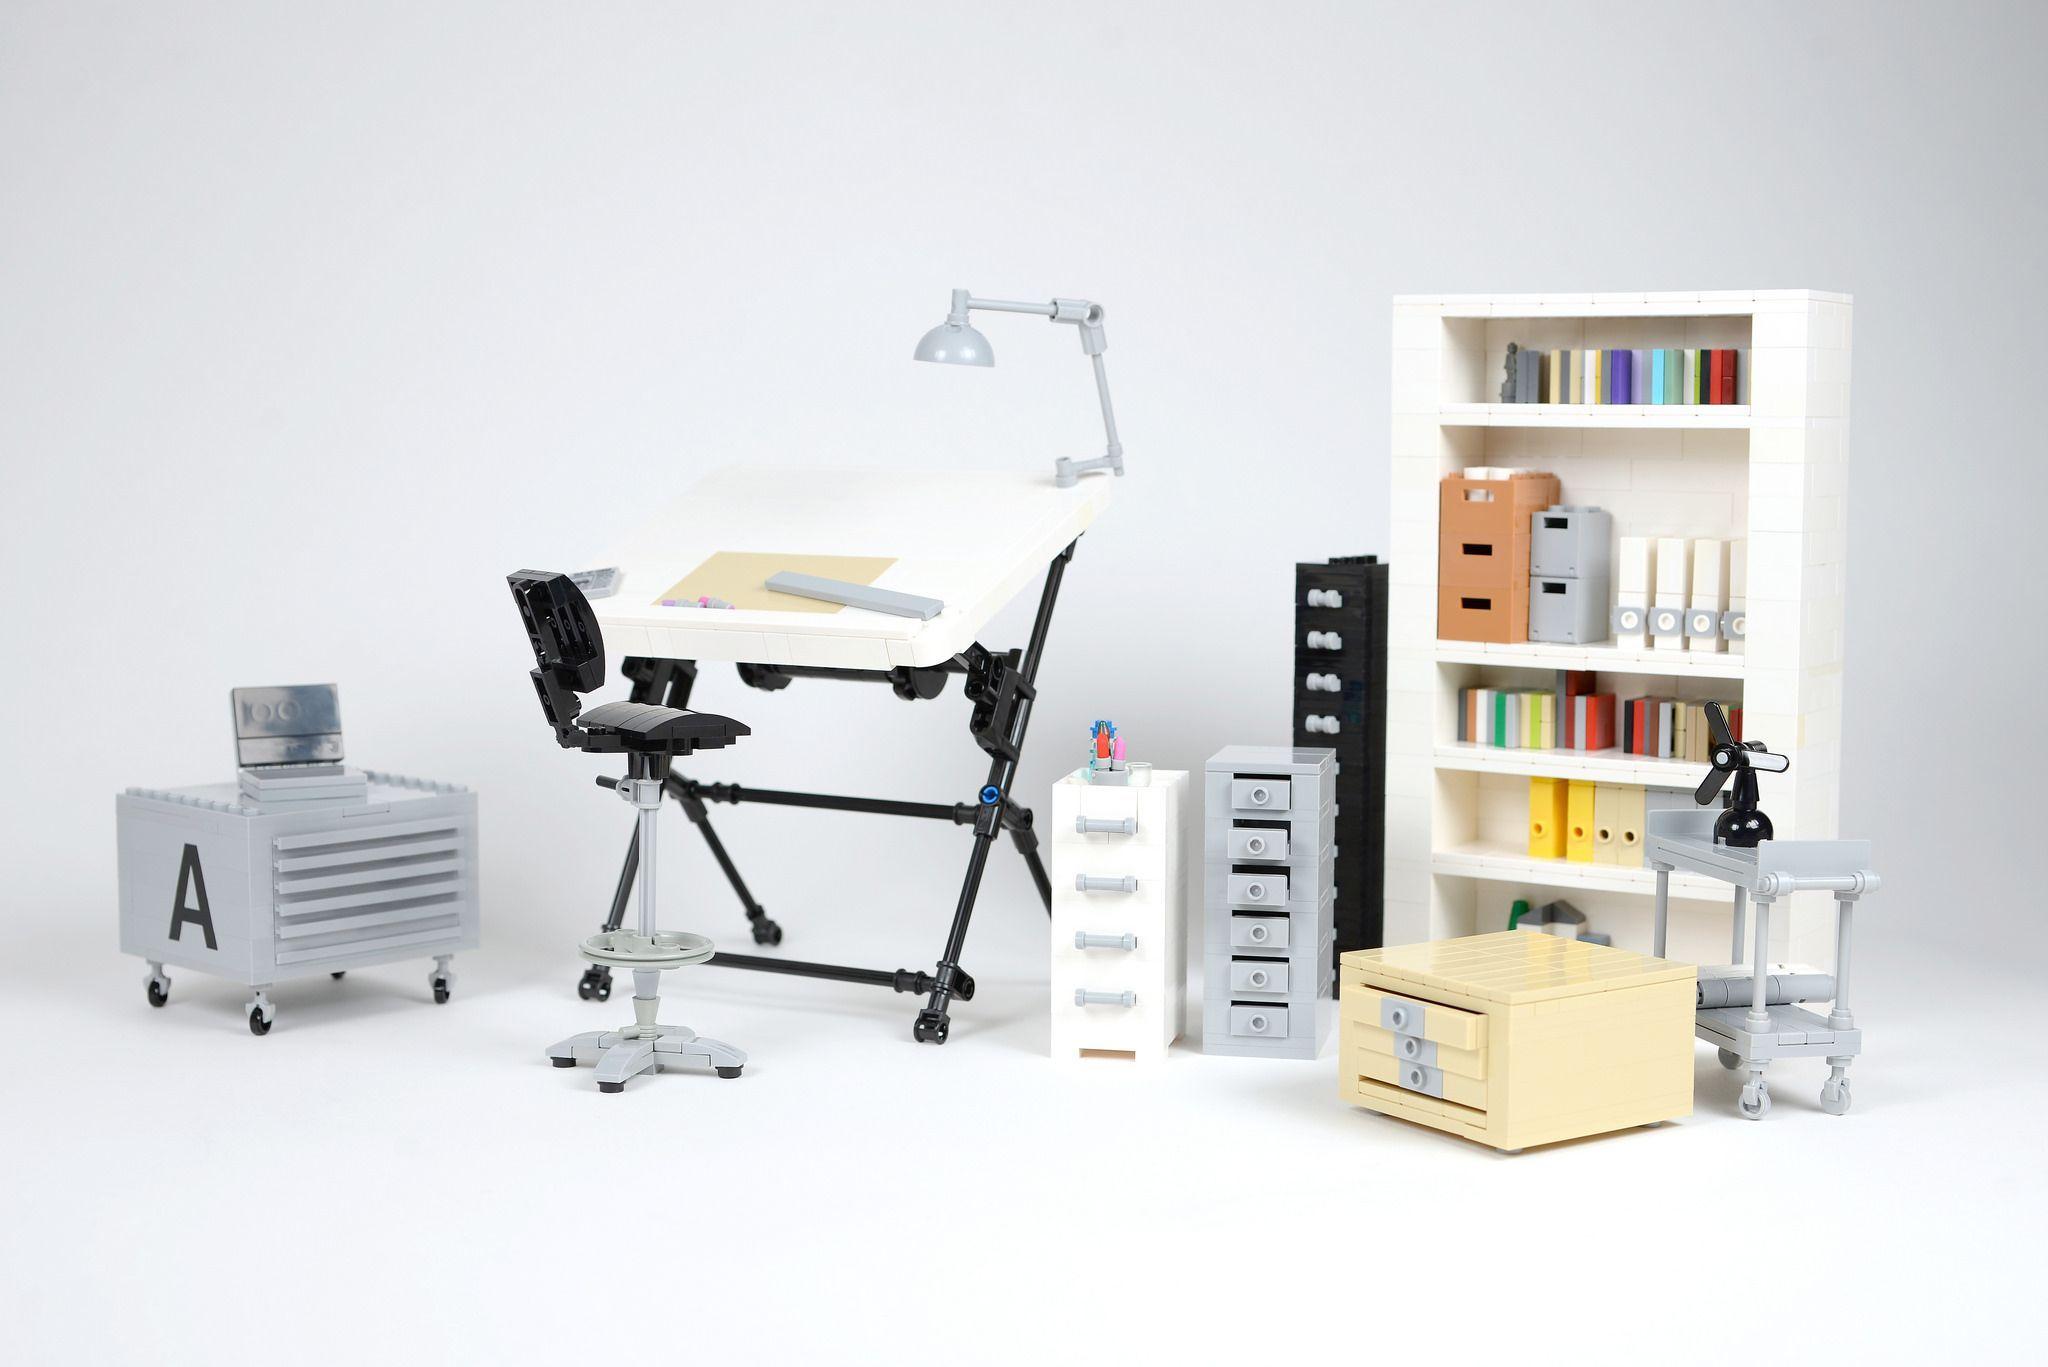 architect office supplies. Ideas.lego.com/projects/168671 Lego Architect Office Drawer Table  Furnitures Coffee Supplies